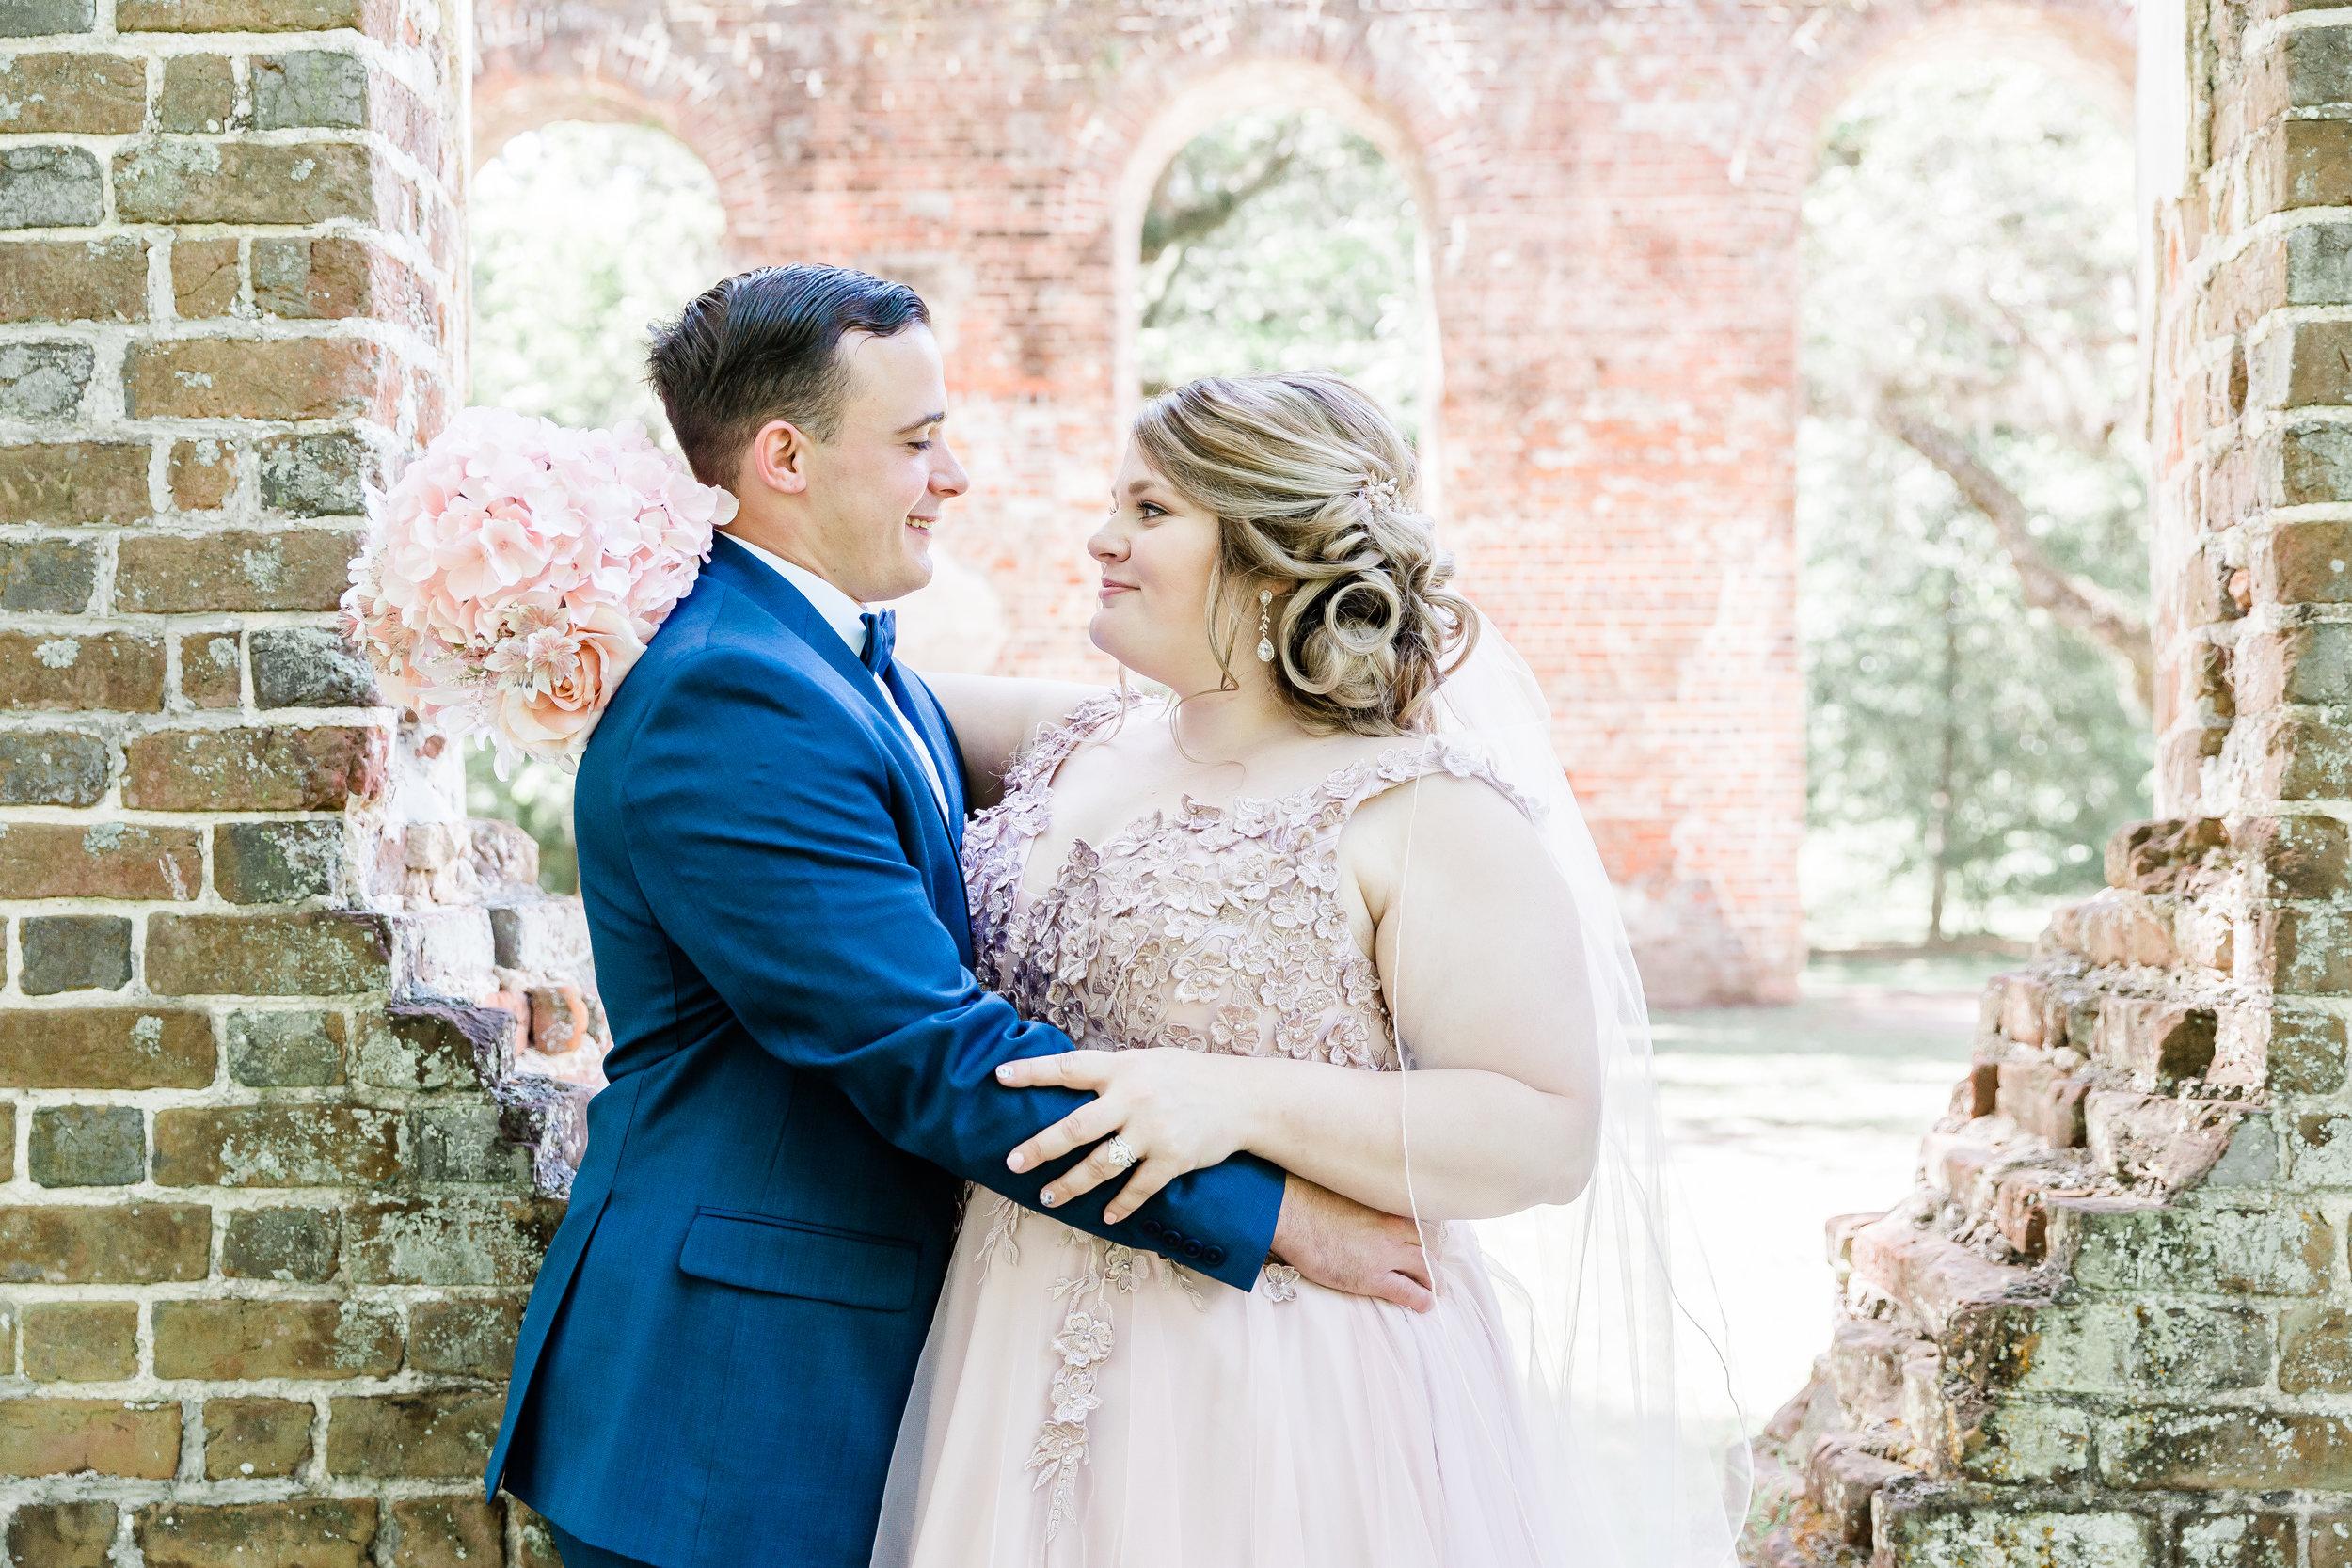 20190417-Southern Lens Photography-savannah family photographer- Ashley and Zack-old sheldon church ruins-201960.jpg